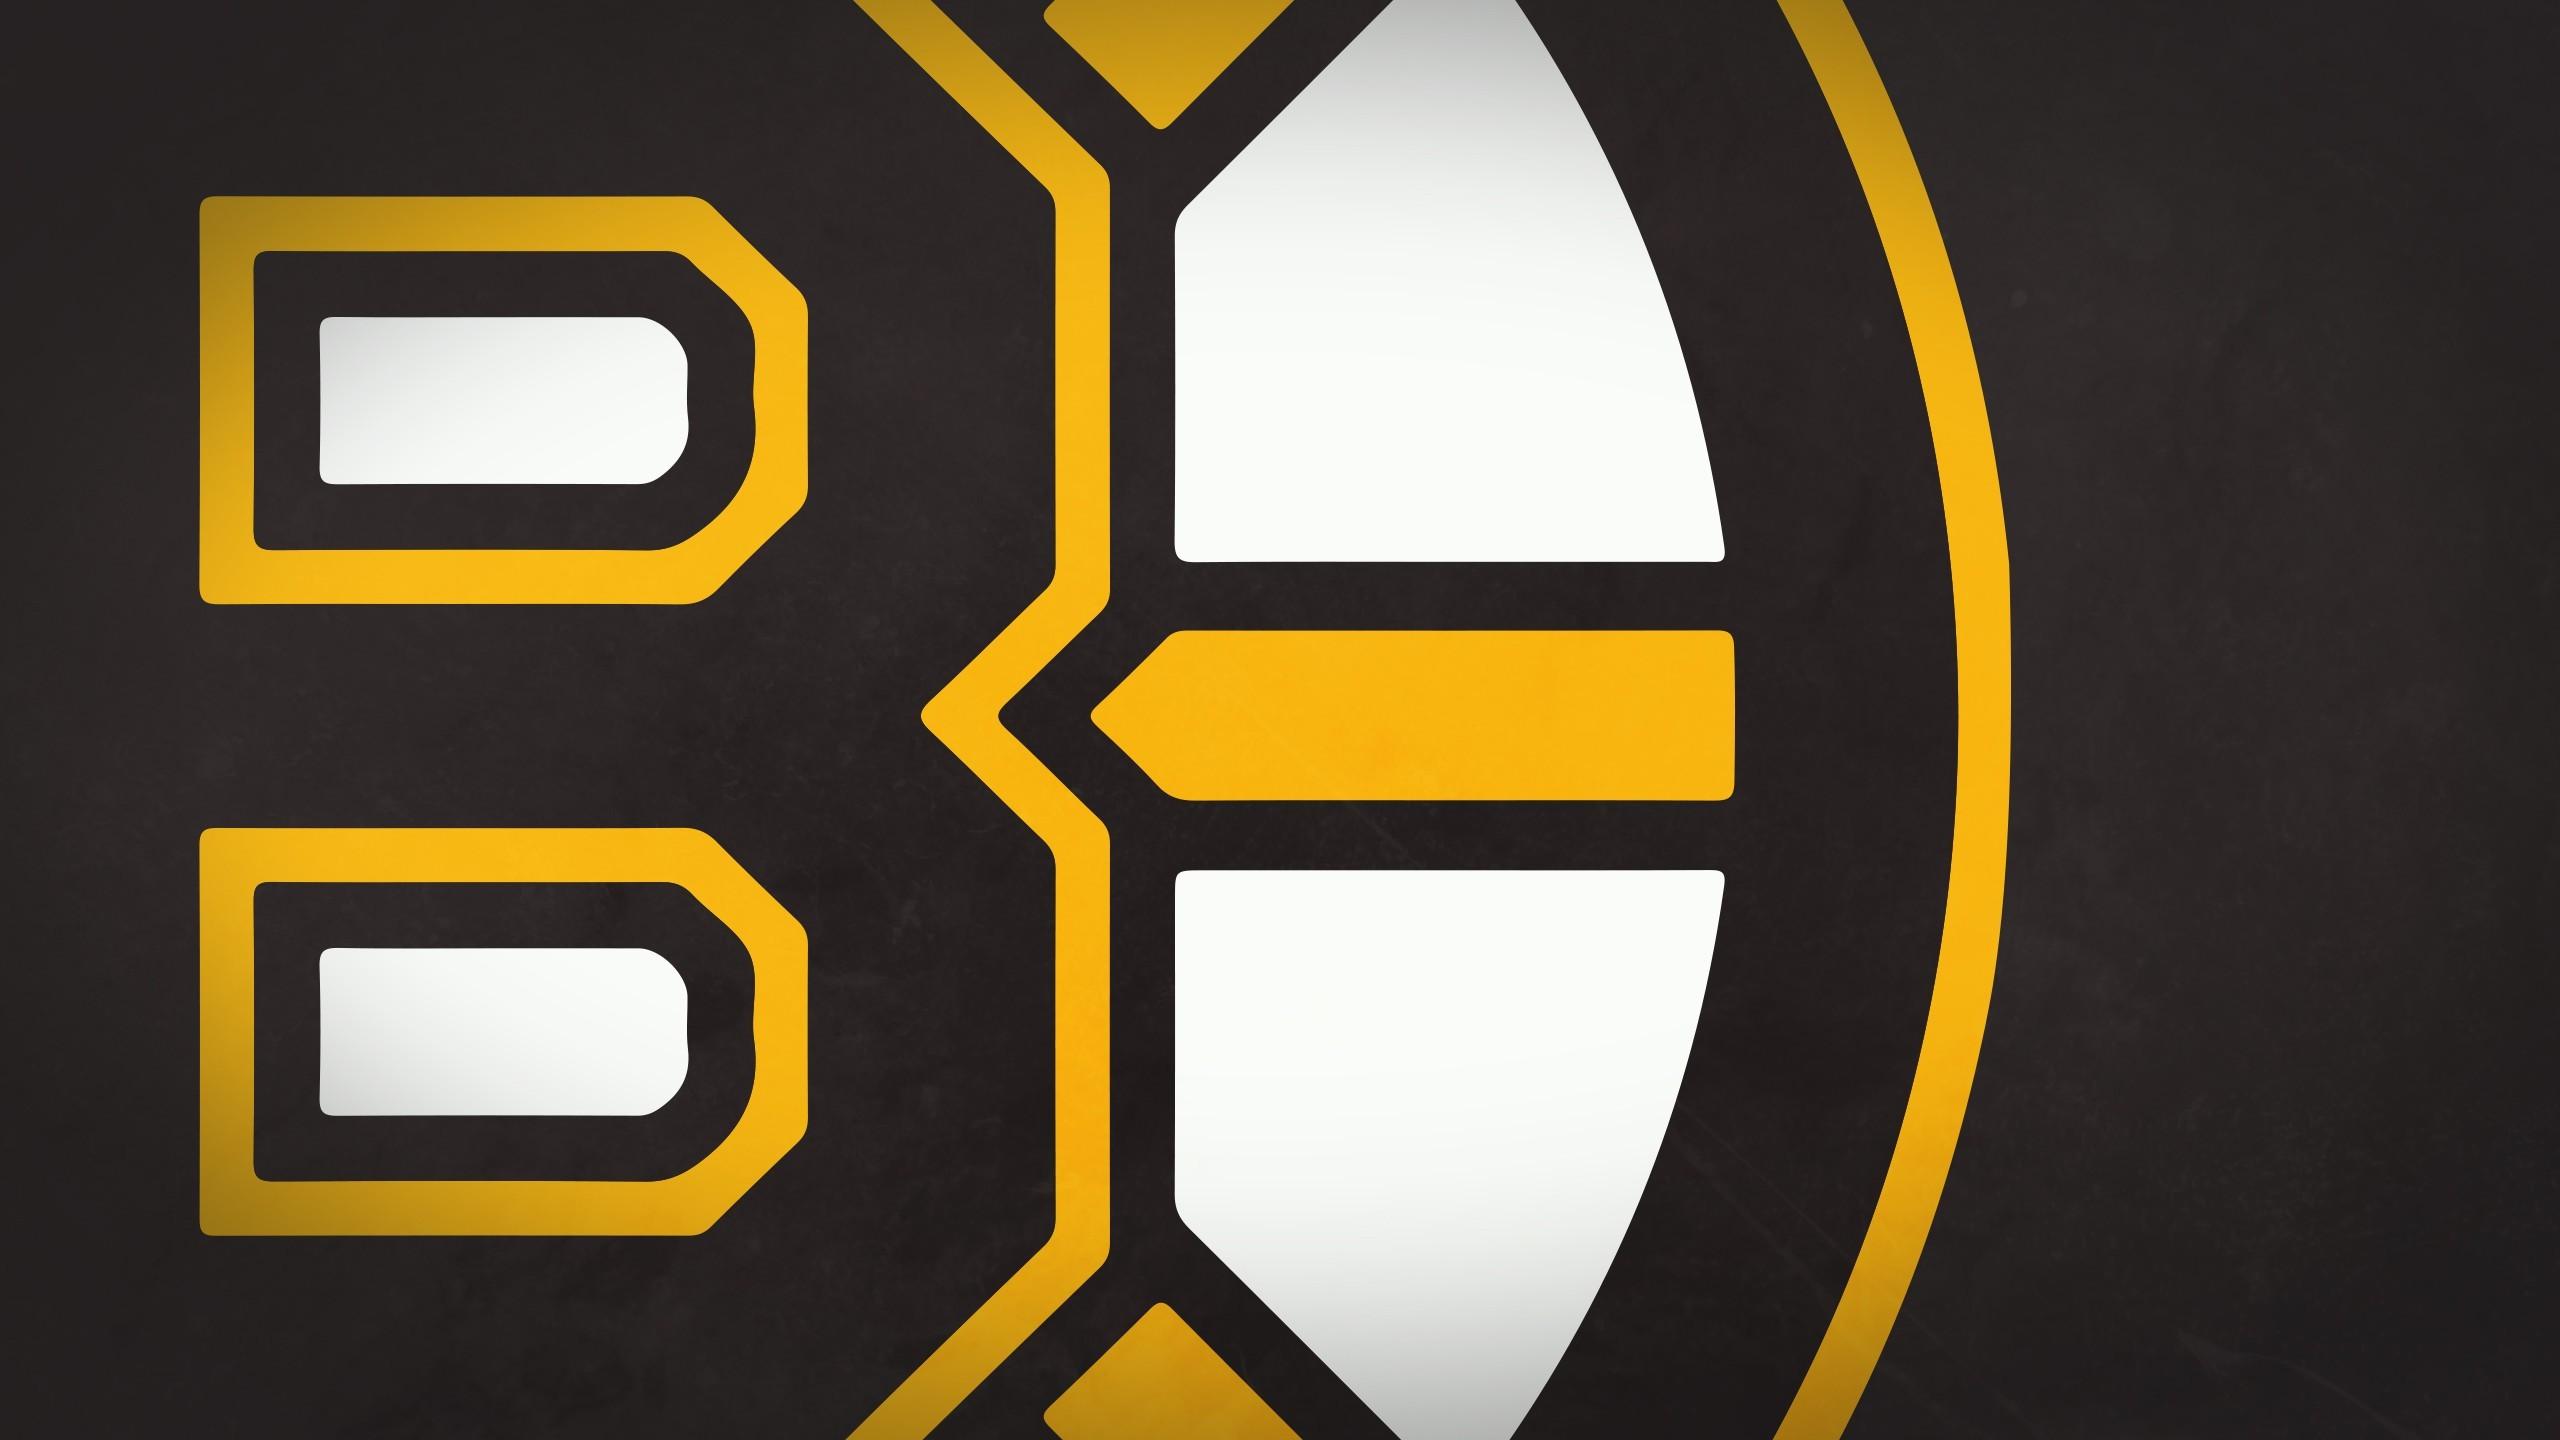 HD Wallpaper   Background ID:415082. Sports Boston Bruins. 0  Like. Favorite